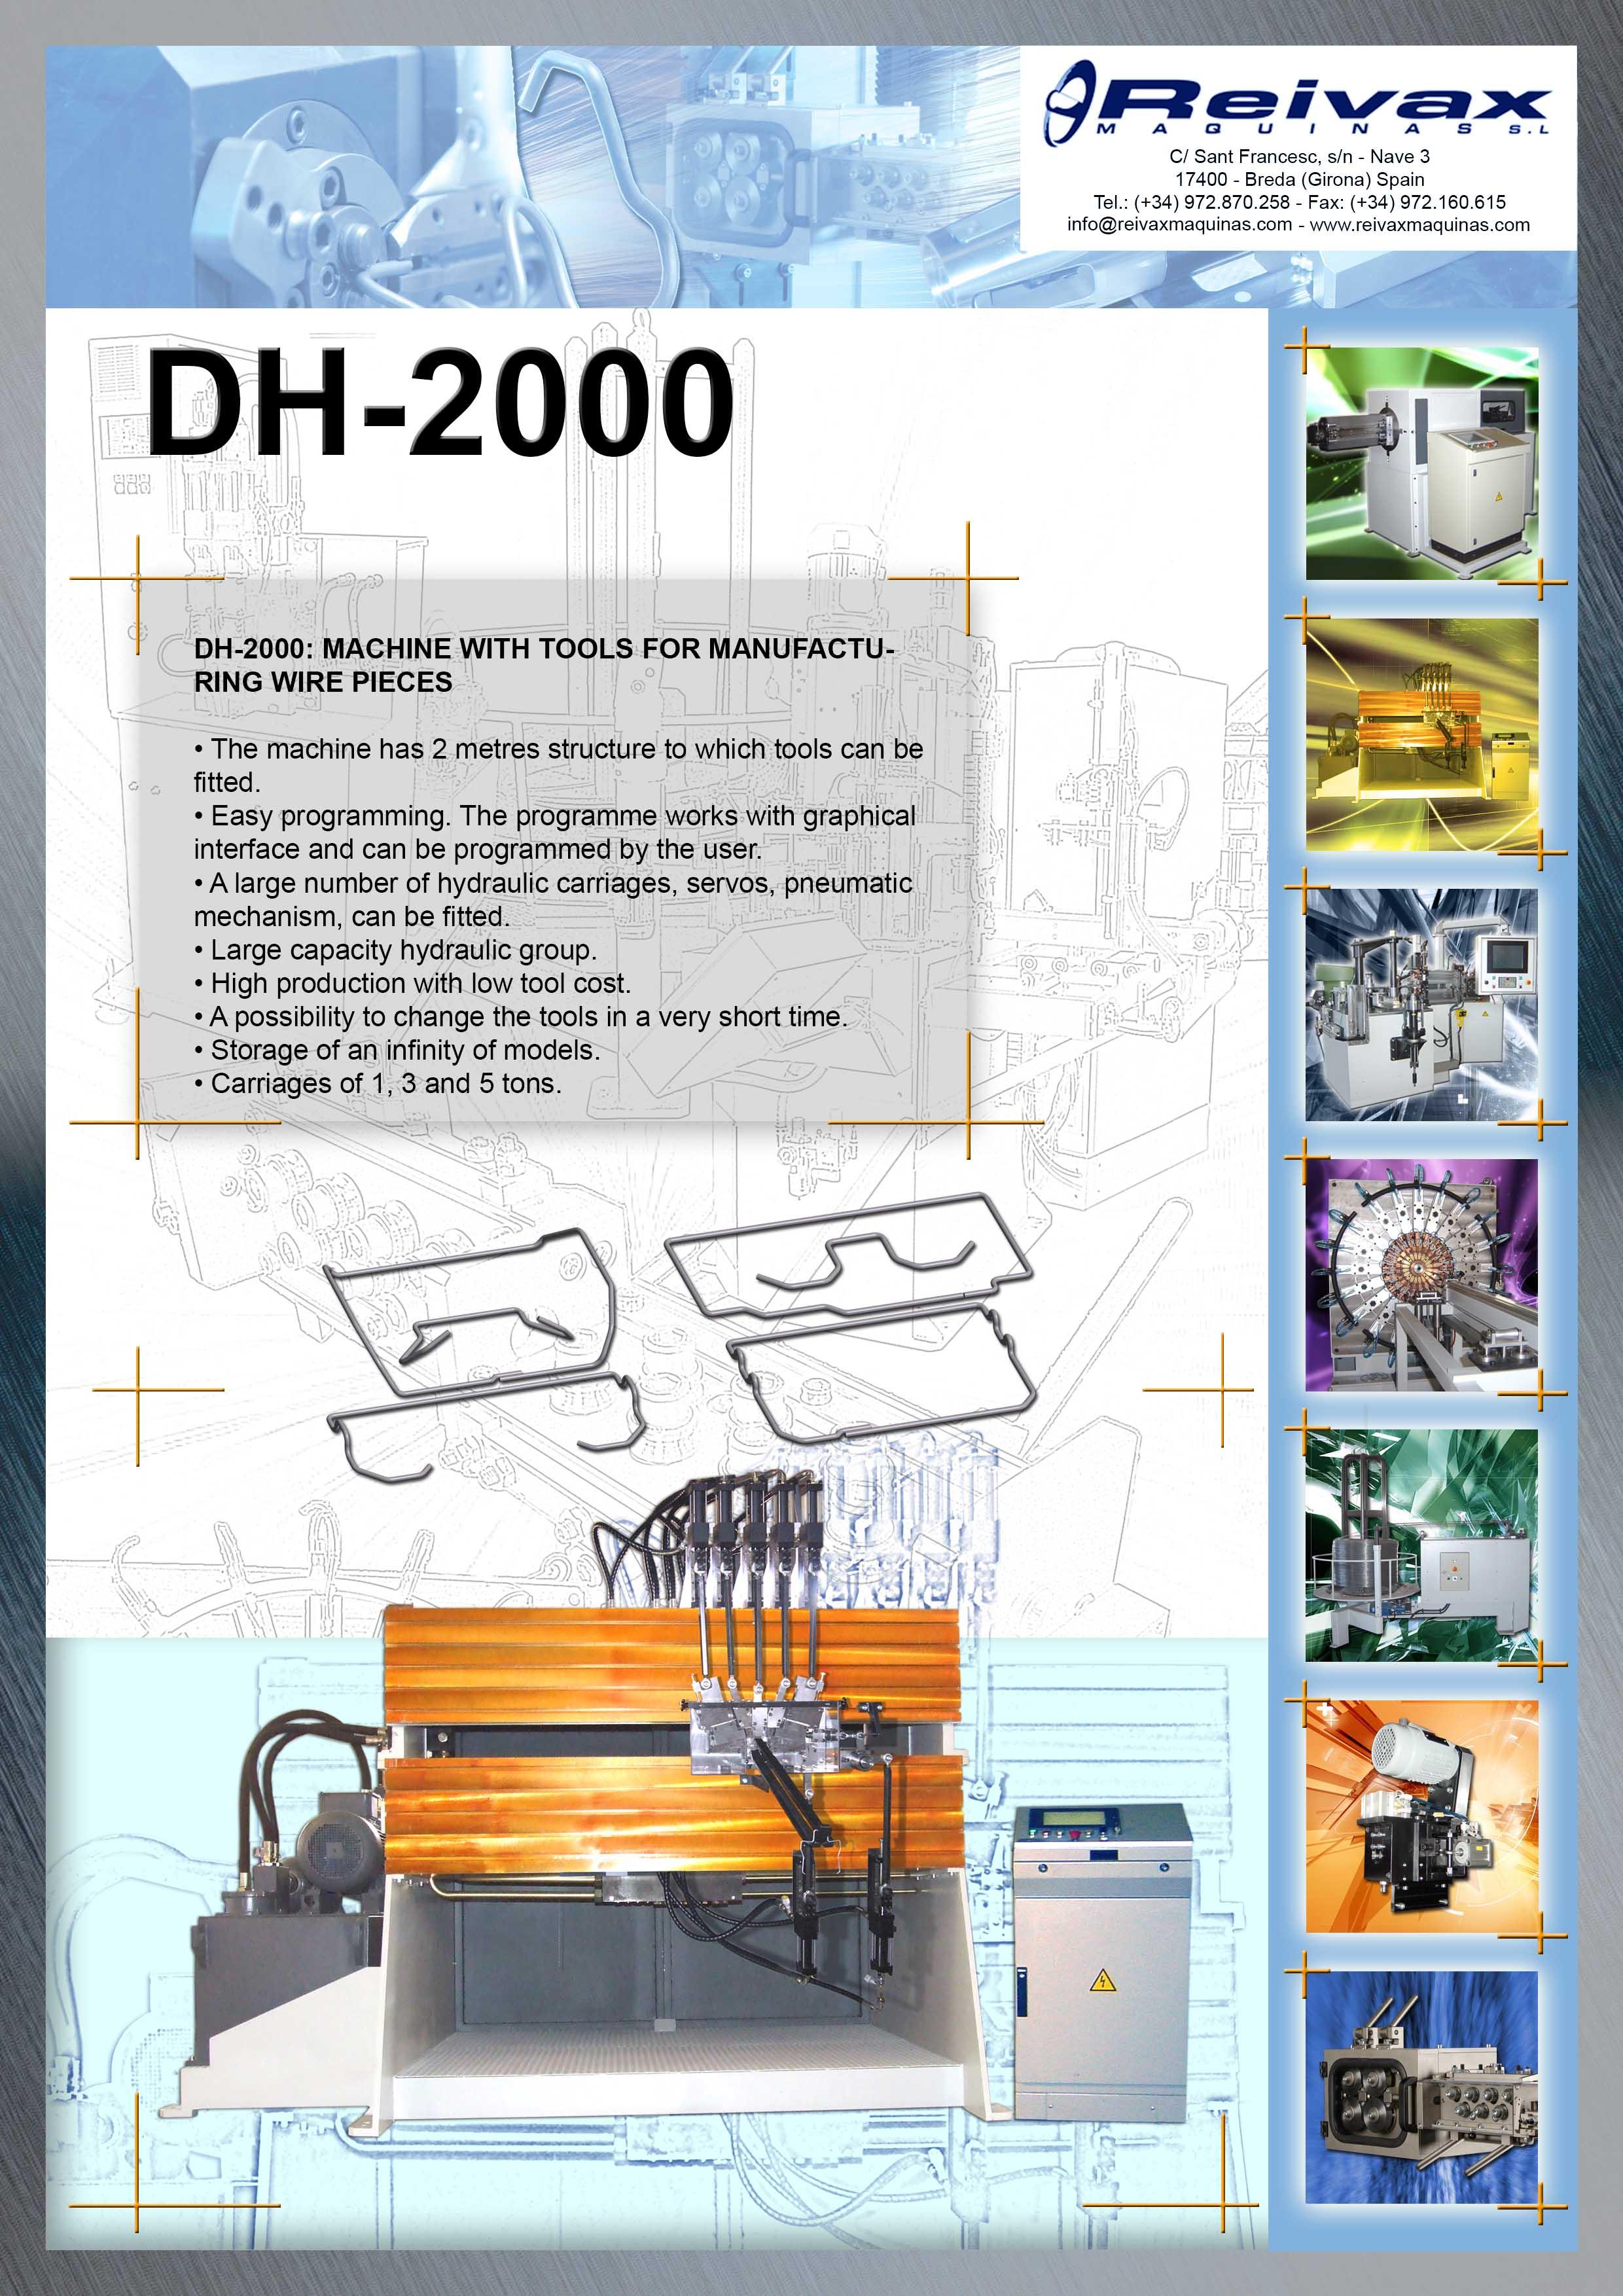 ReivaxMaquinas: Technical Details DH-2000